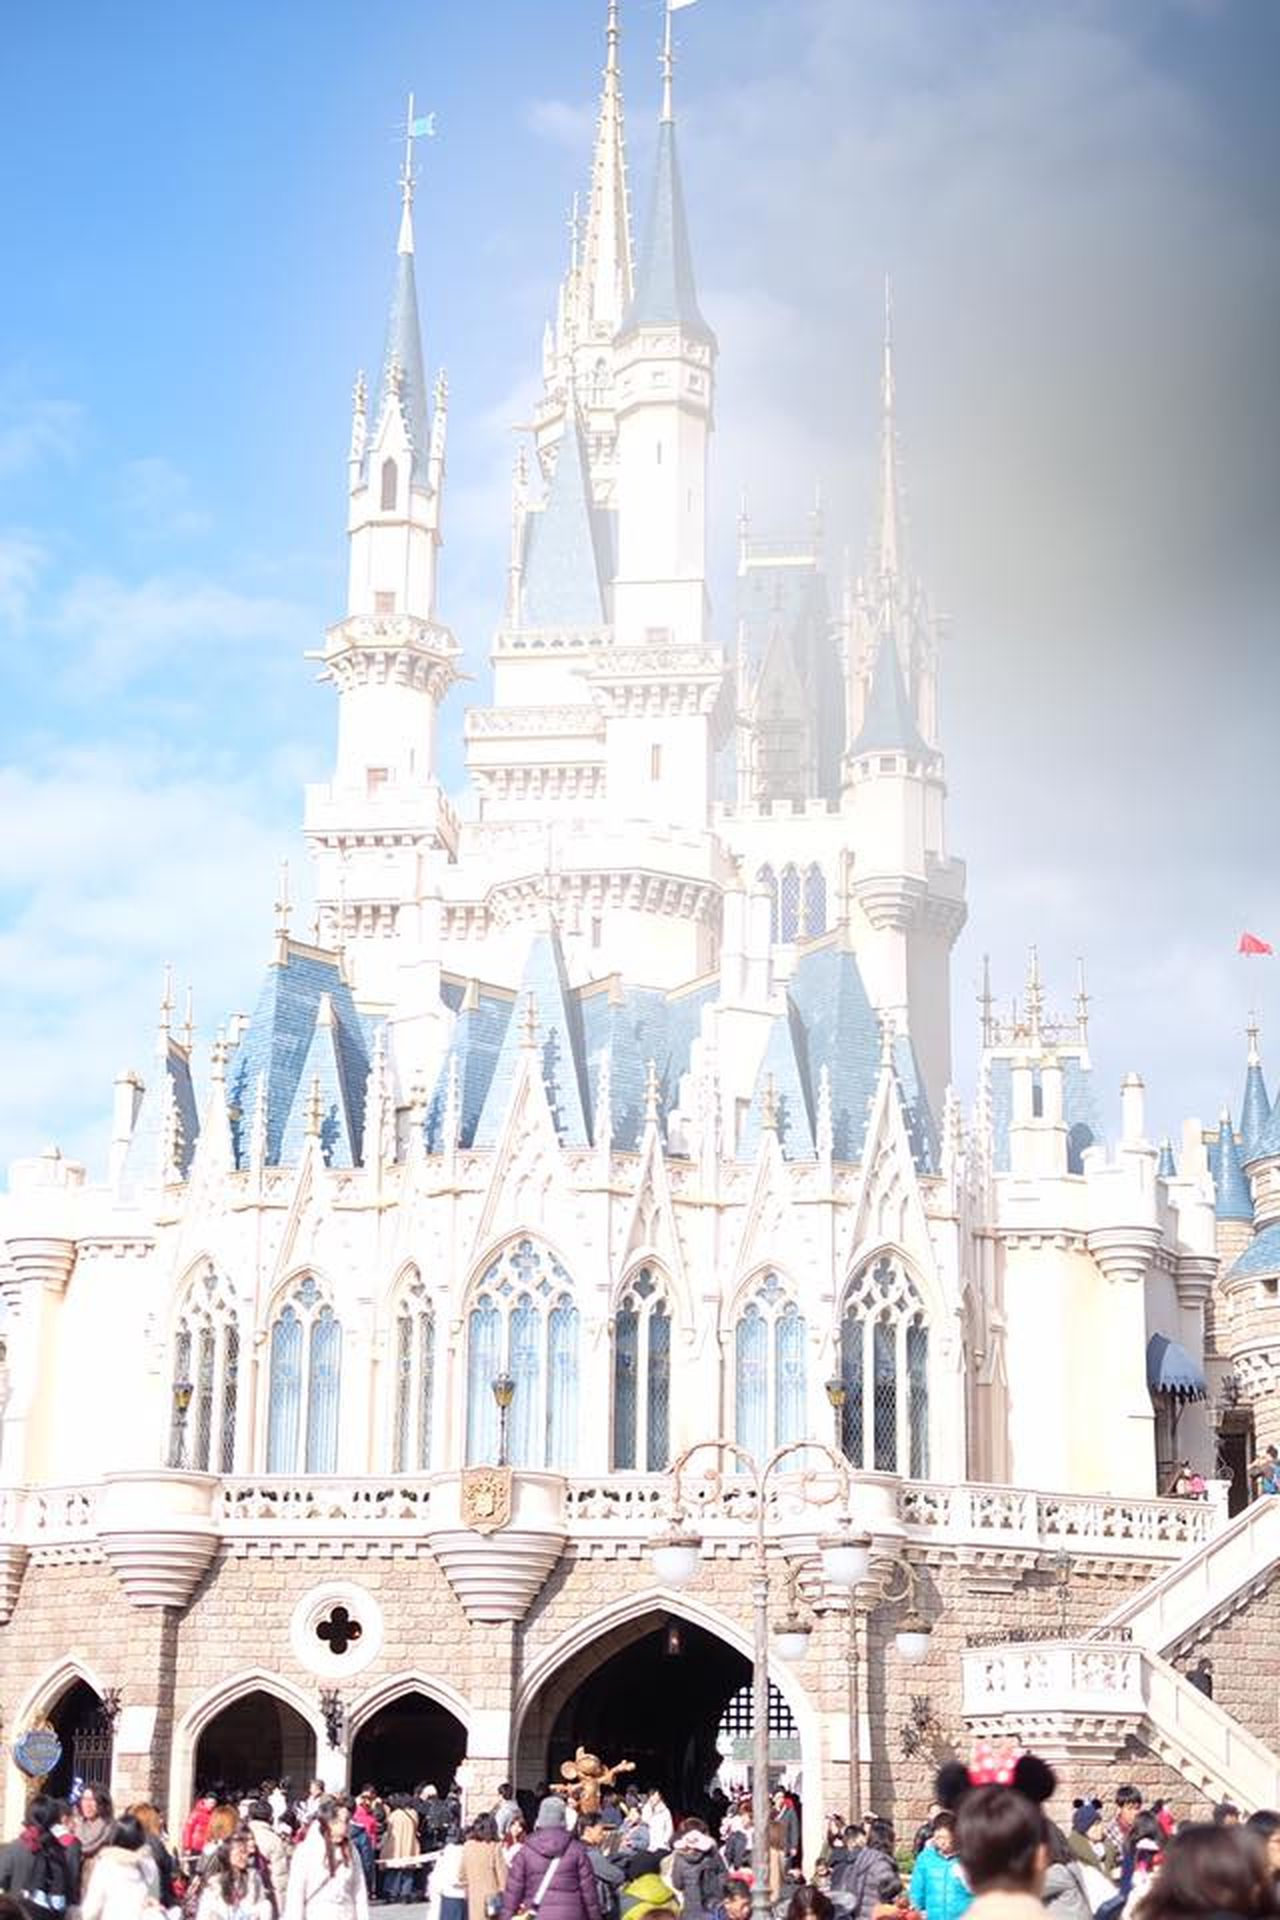 #Disney #disneyland #mickeymouse #minniemouse #Tokyo